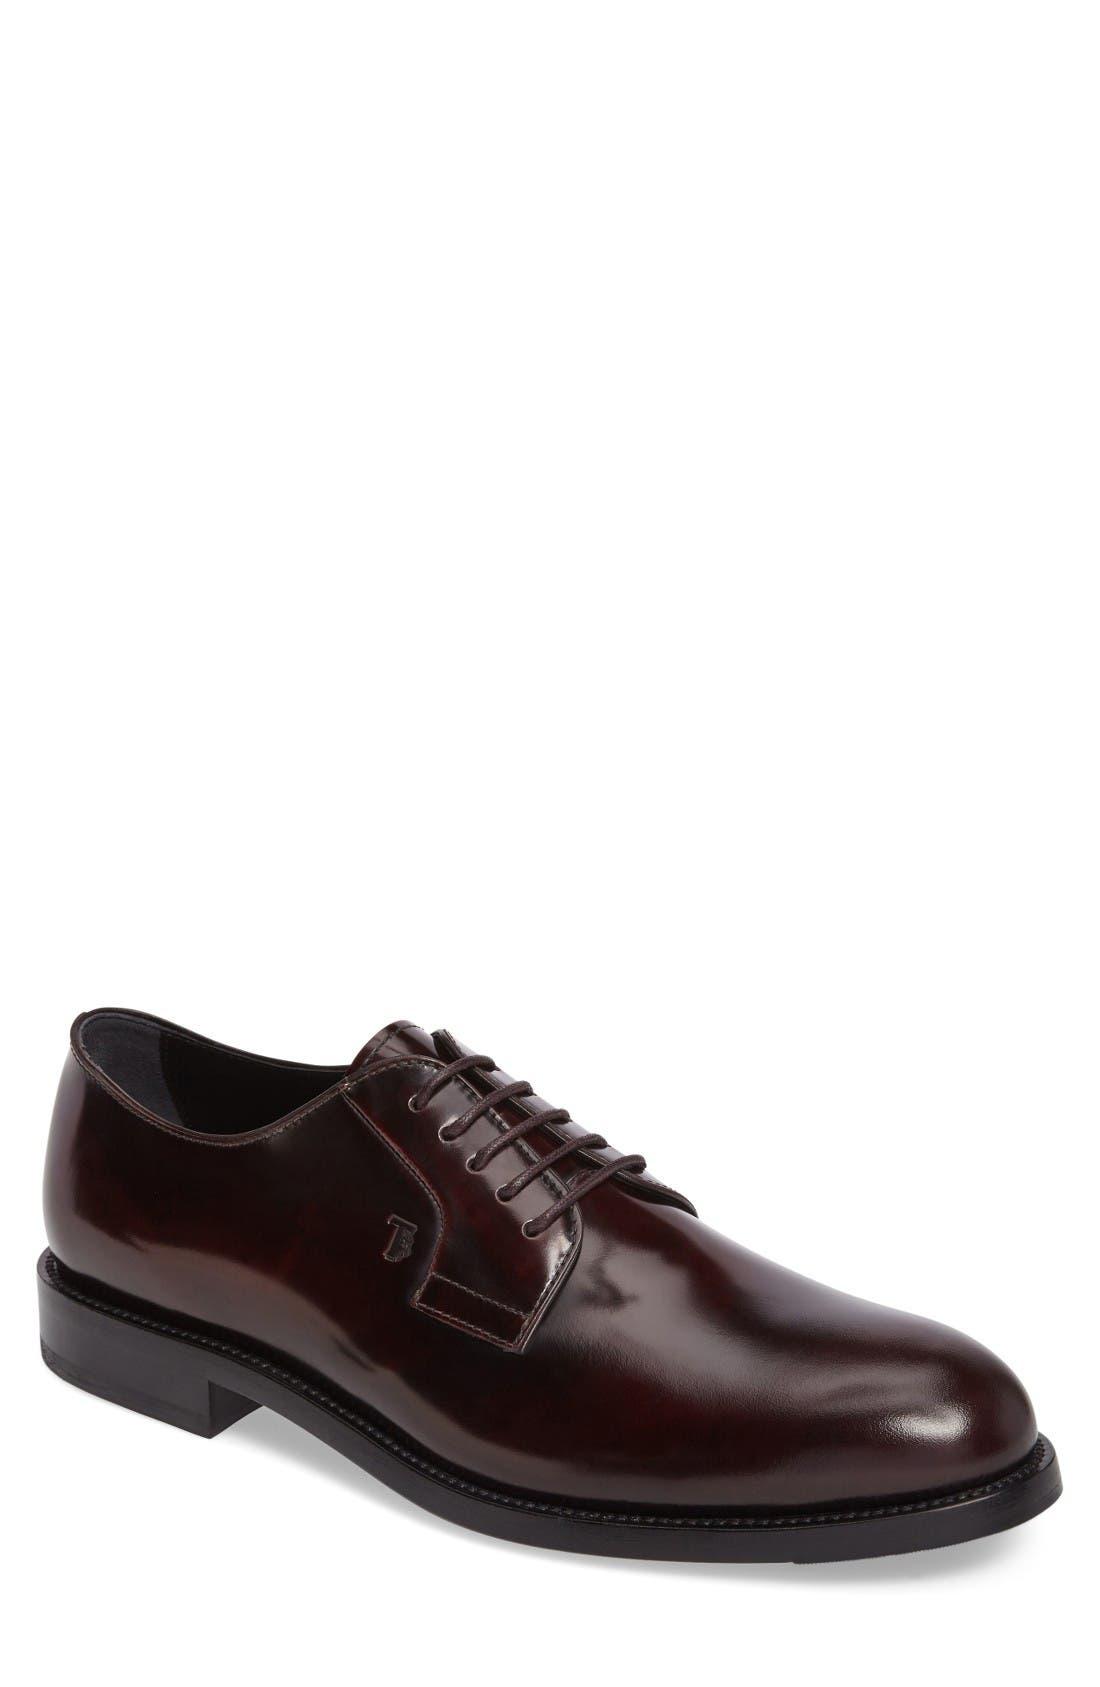 Plain Toe Derby,                             Main thumbnail 1, color,                             Burgundy Leather